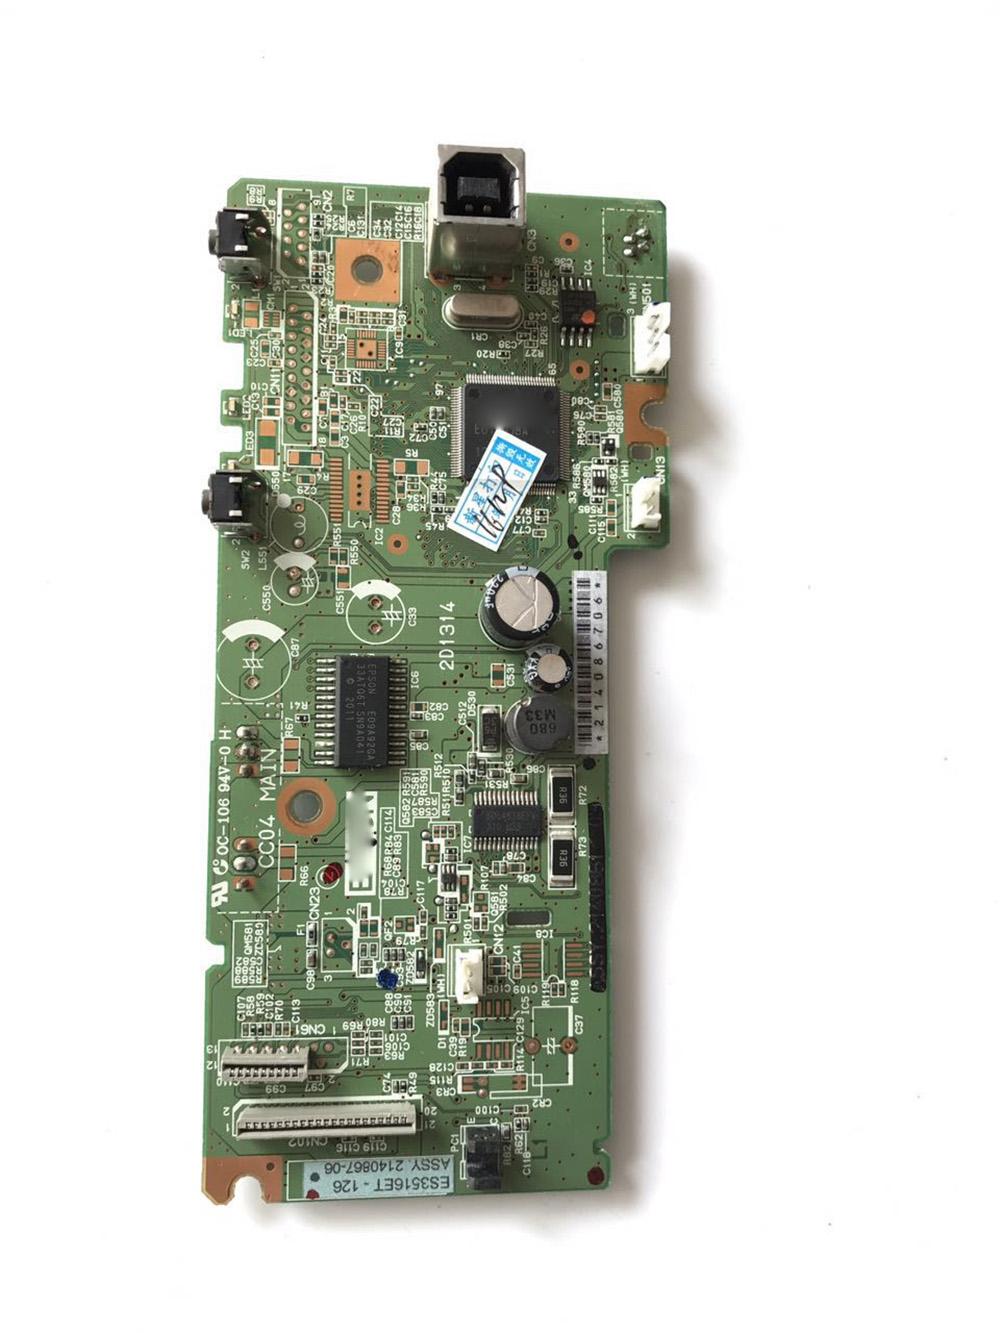 US $16 88 |Original Main board Motherboard For Epson L211 L351 L353 L360  L363 L220 L301 L110 L111 L130 L310 L303 L380 L383 printer-in Printer Parts